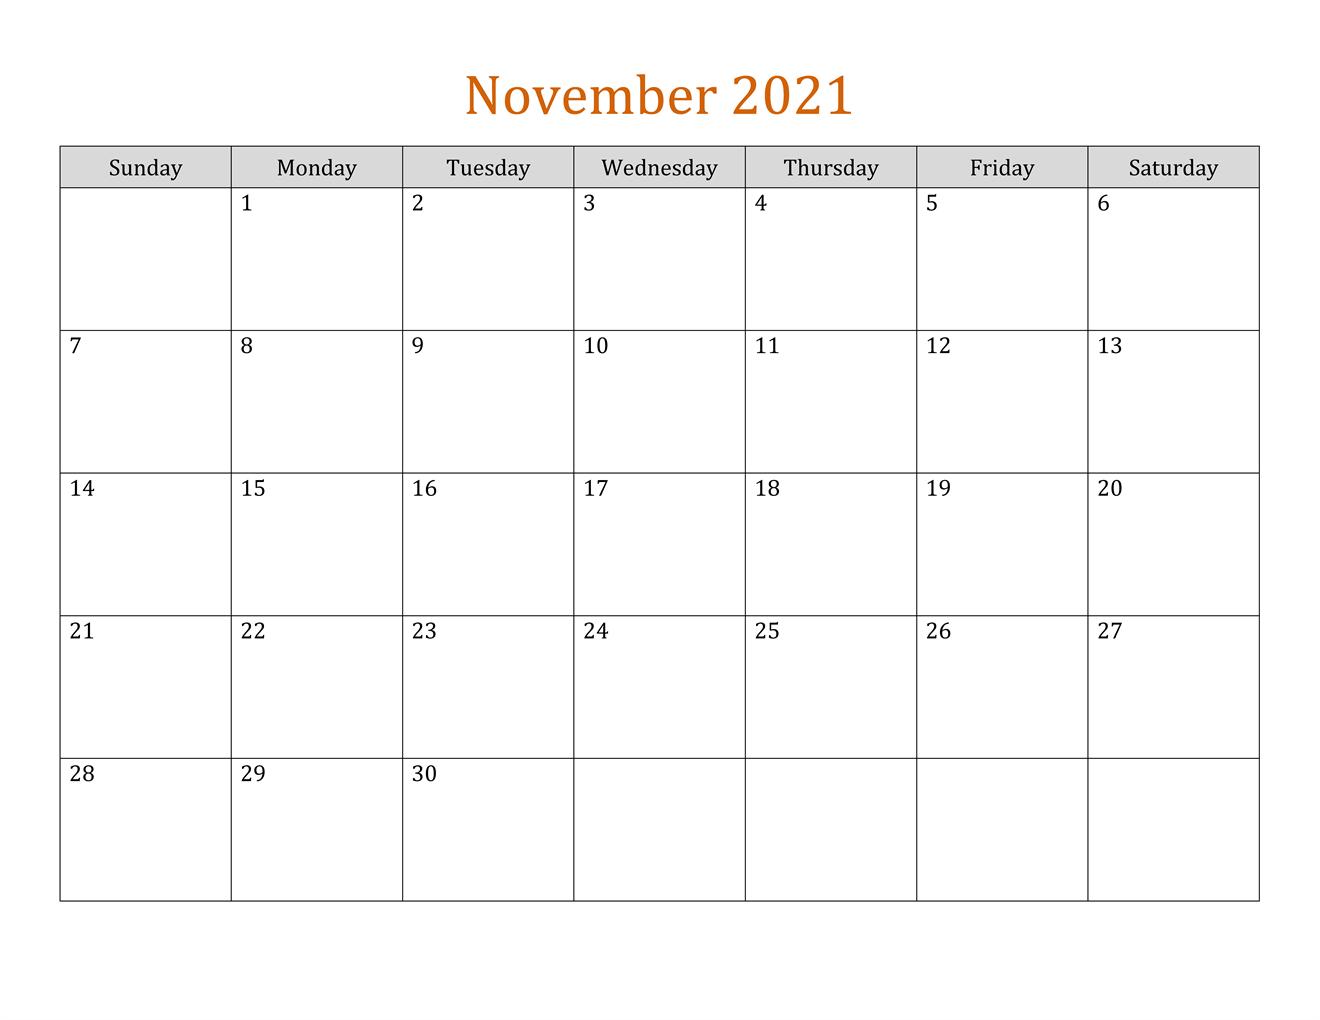 November 2021 Calendar With Holidays